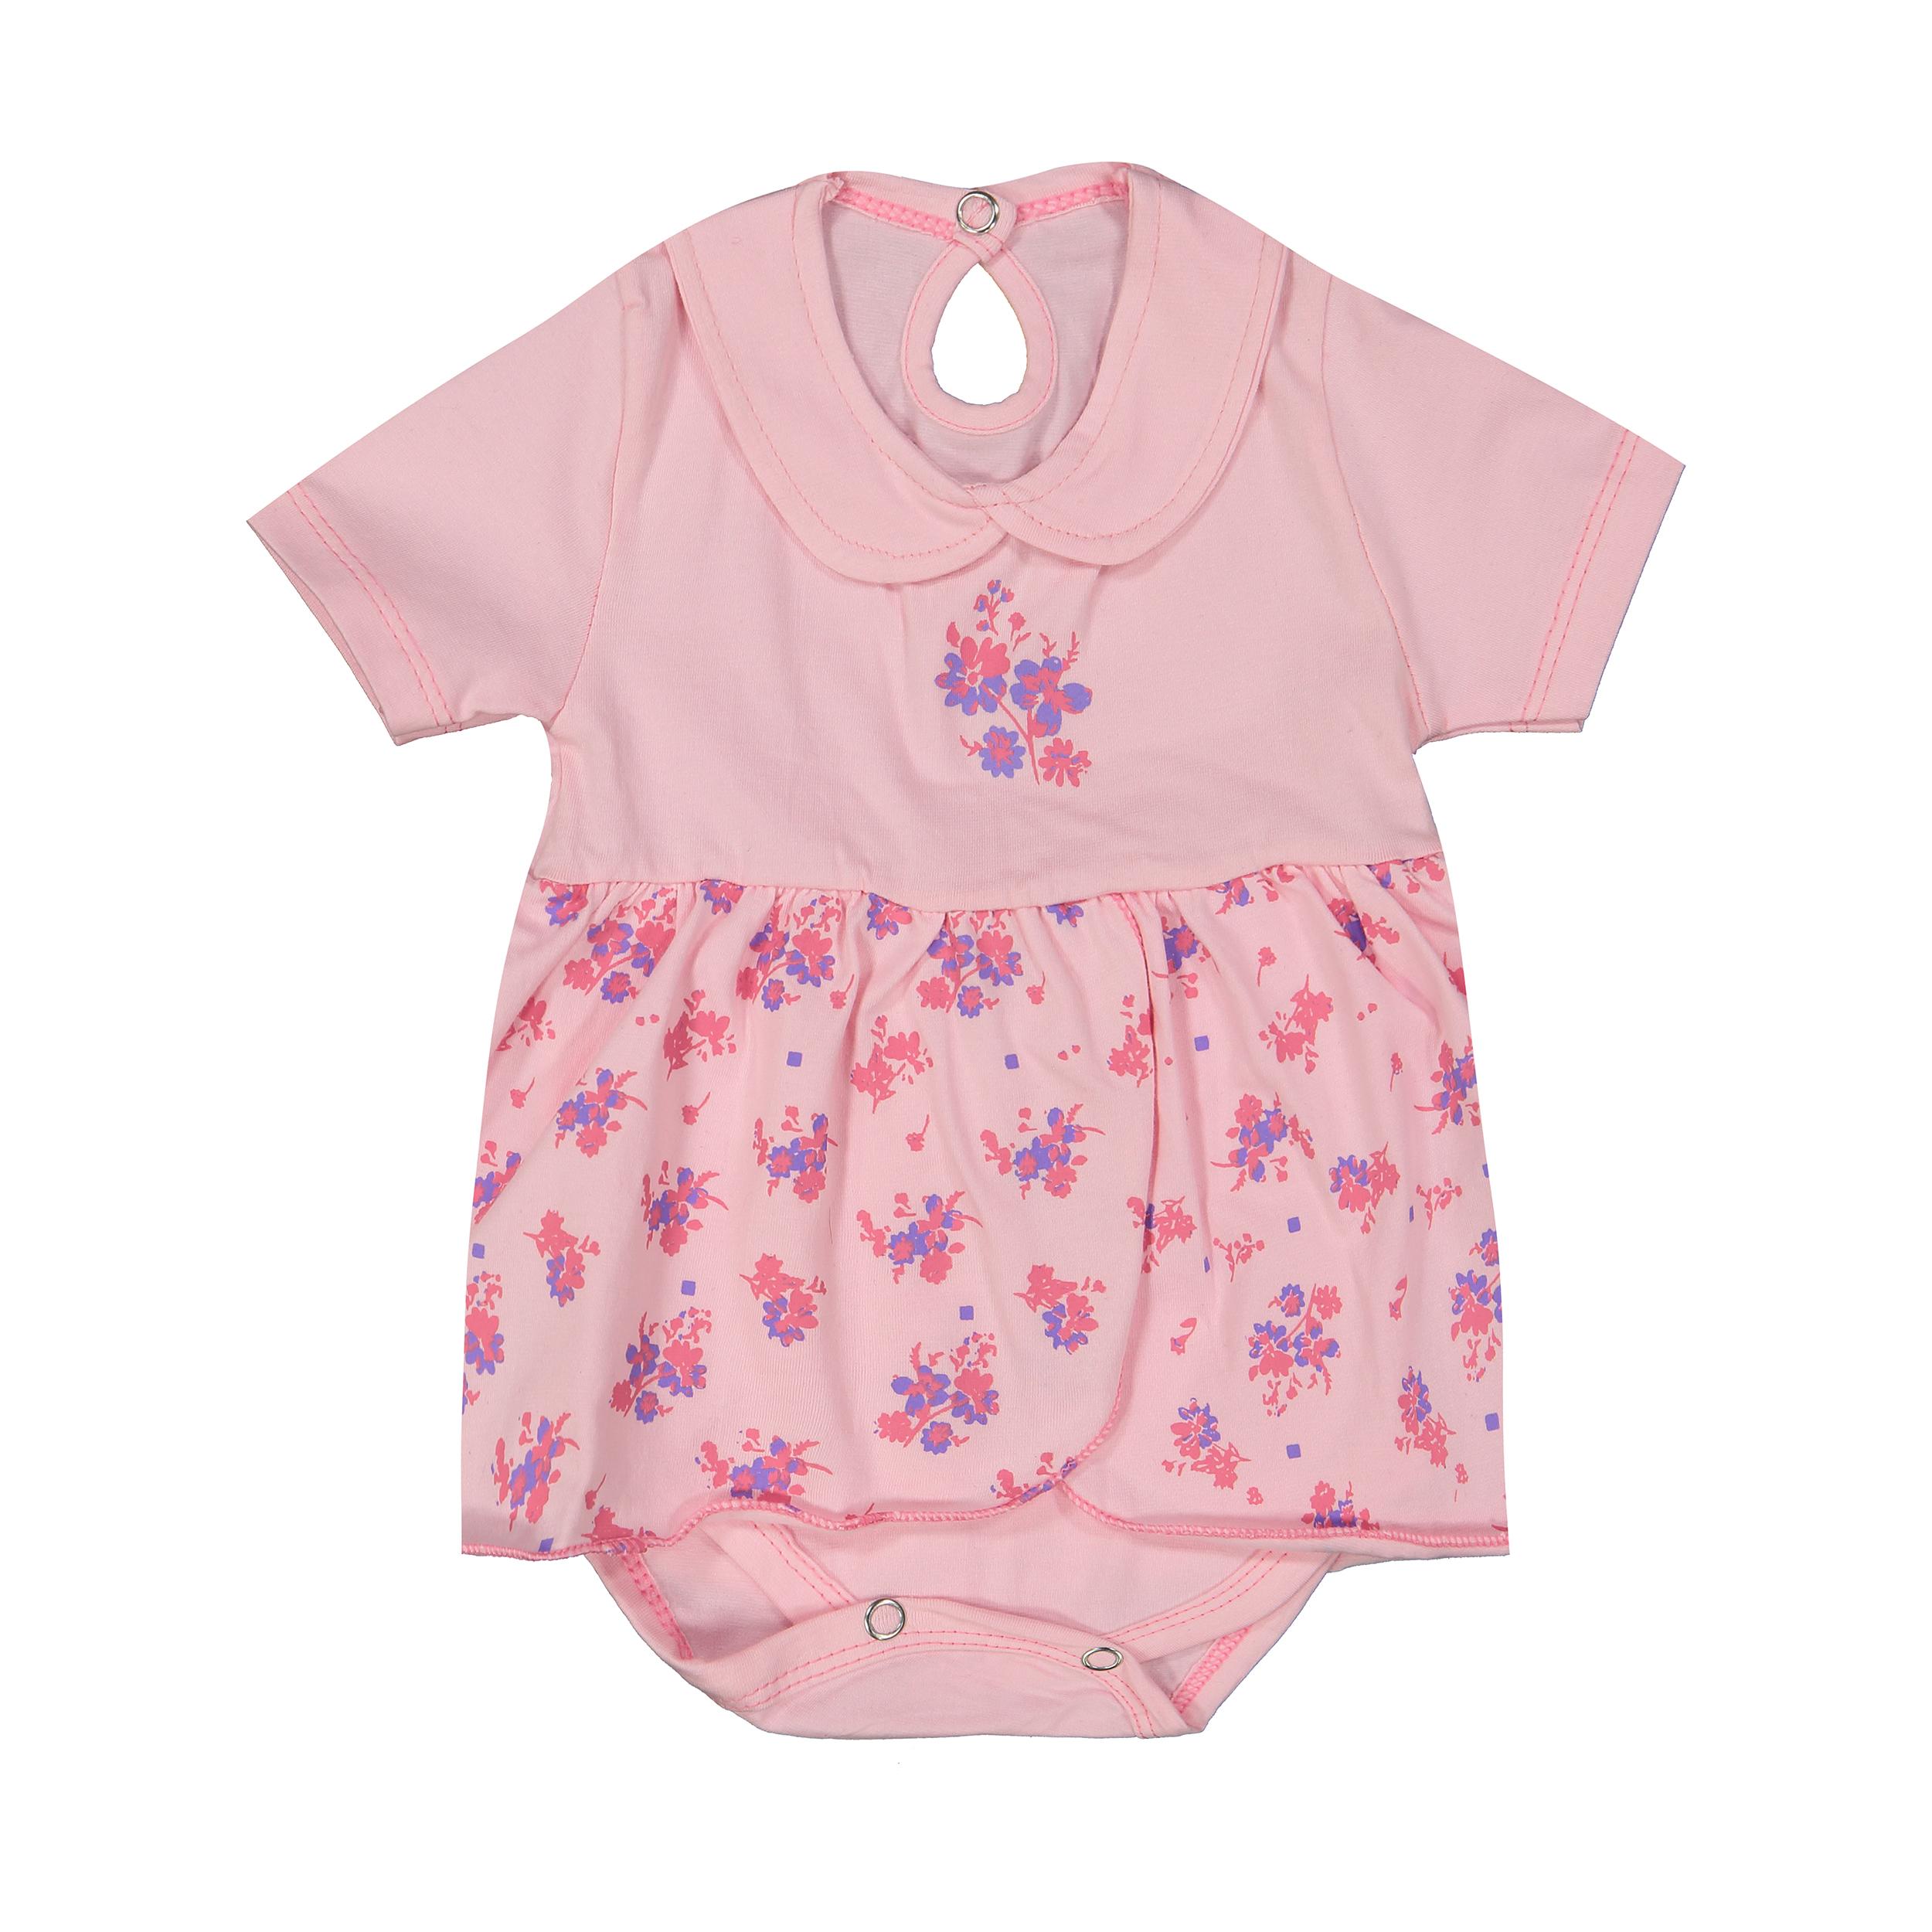 پیراهن نوزادی کد mv24